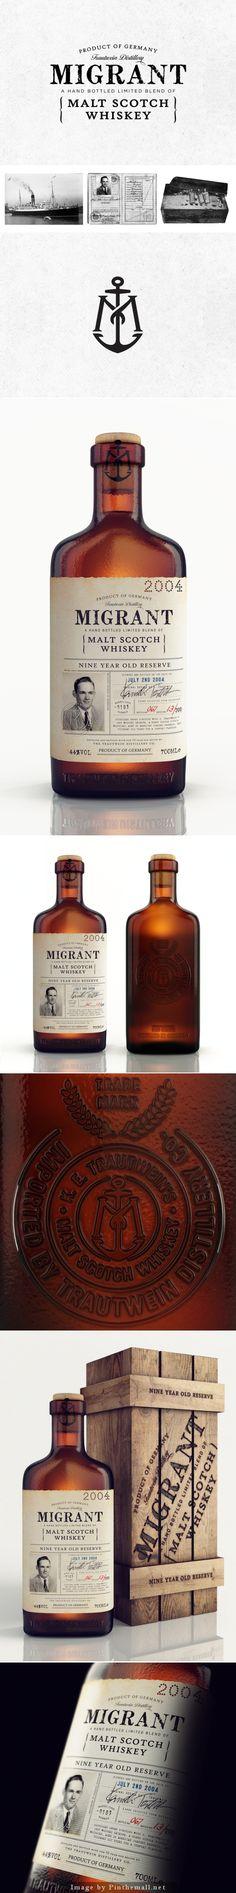 Migrant #Whiskey, Creative Agency: Chad Michael Studio - http://www.packagingoftheworld.com/2014/10/migrant-whiskey.html